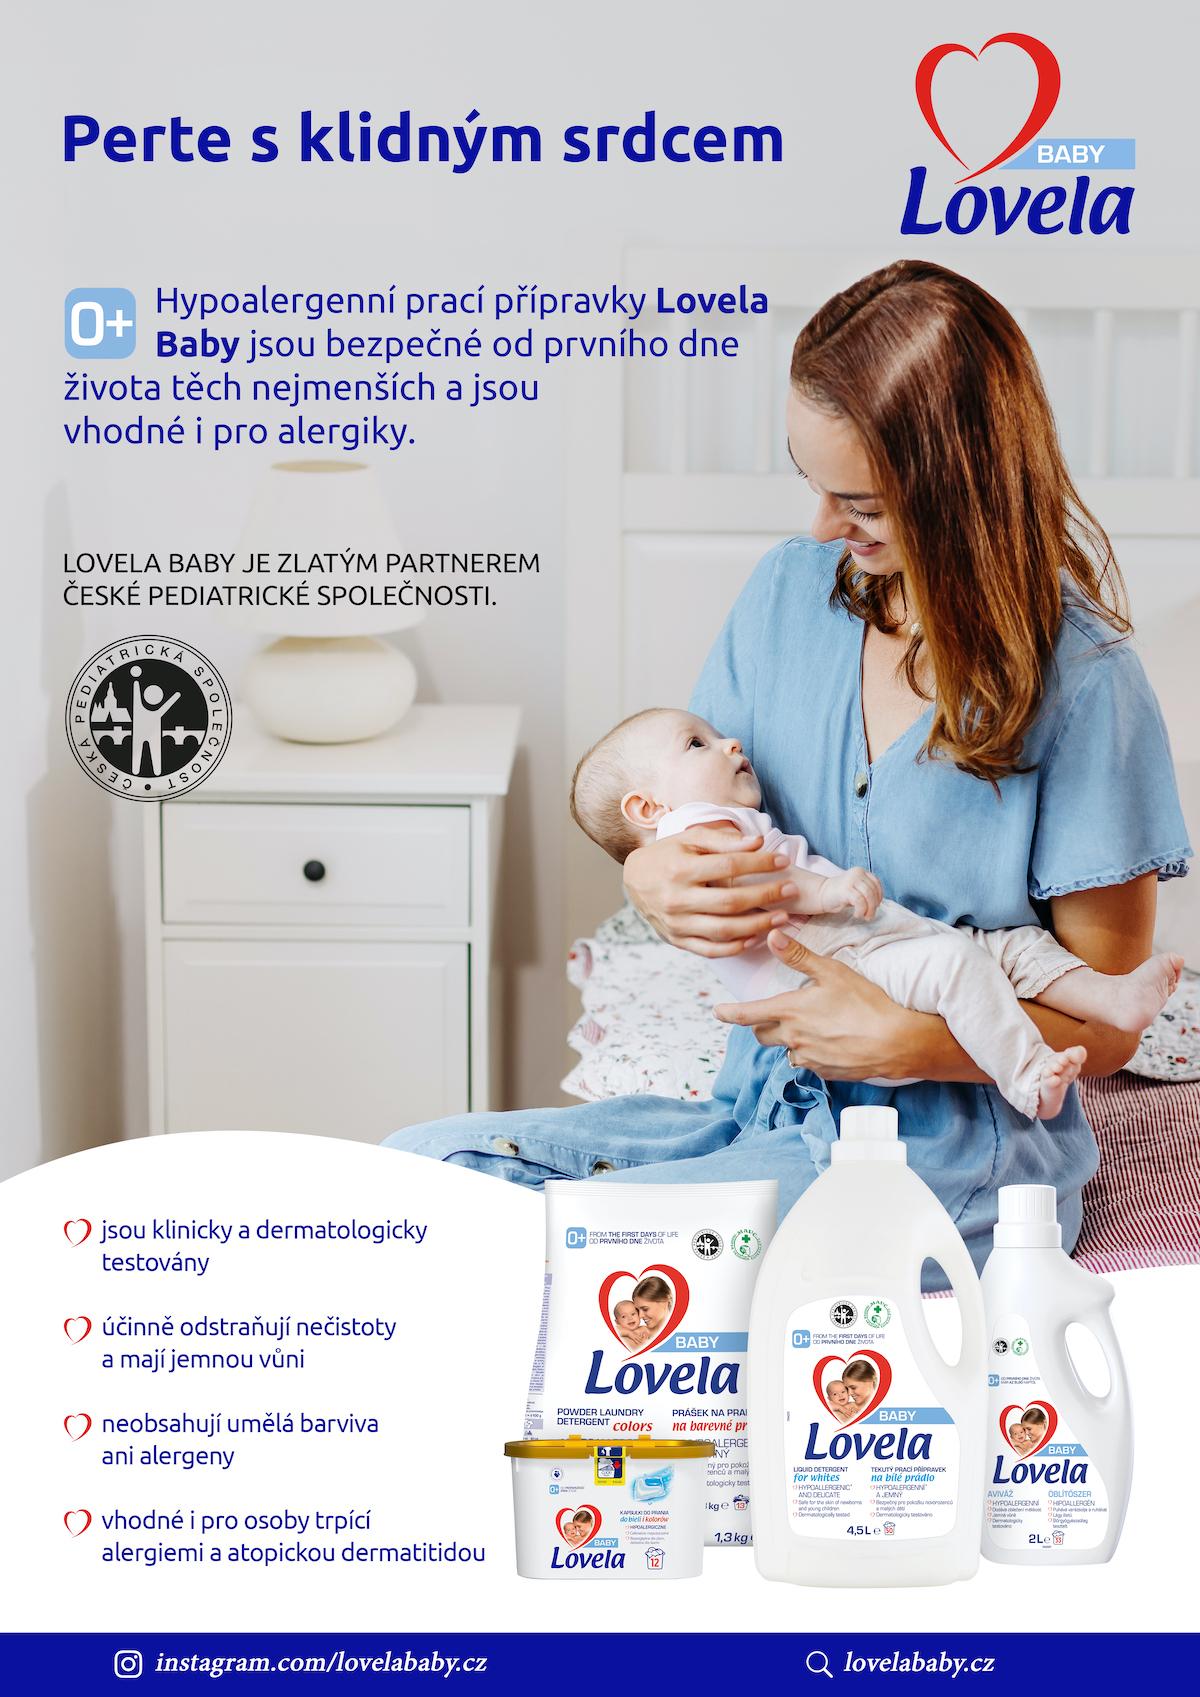 Lovela Baby: Pomáhejme maminkám